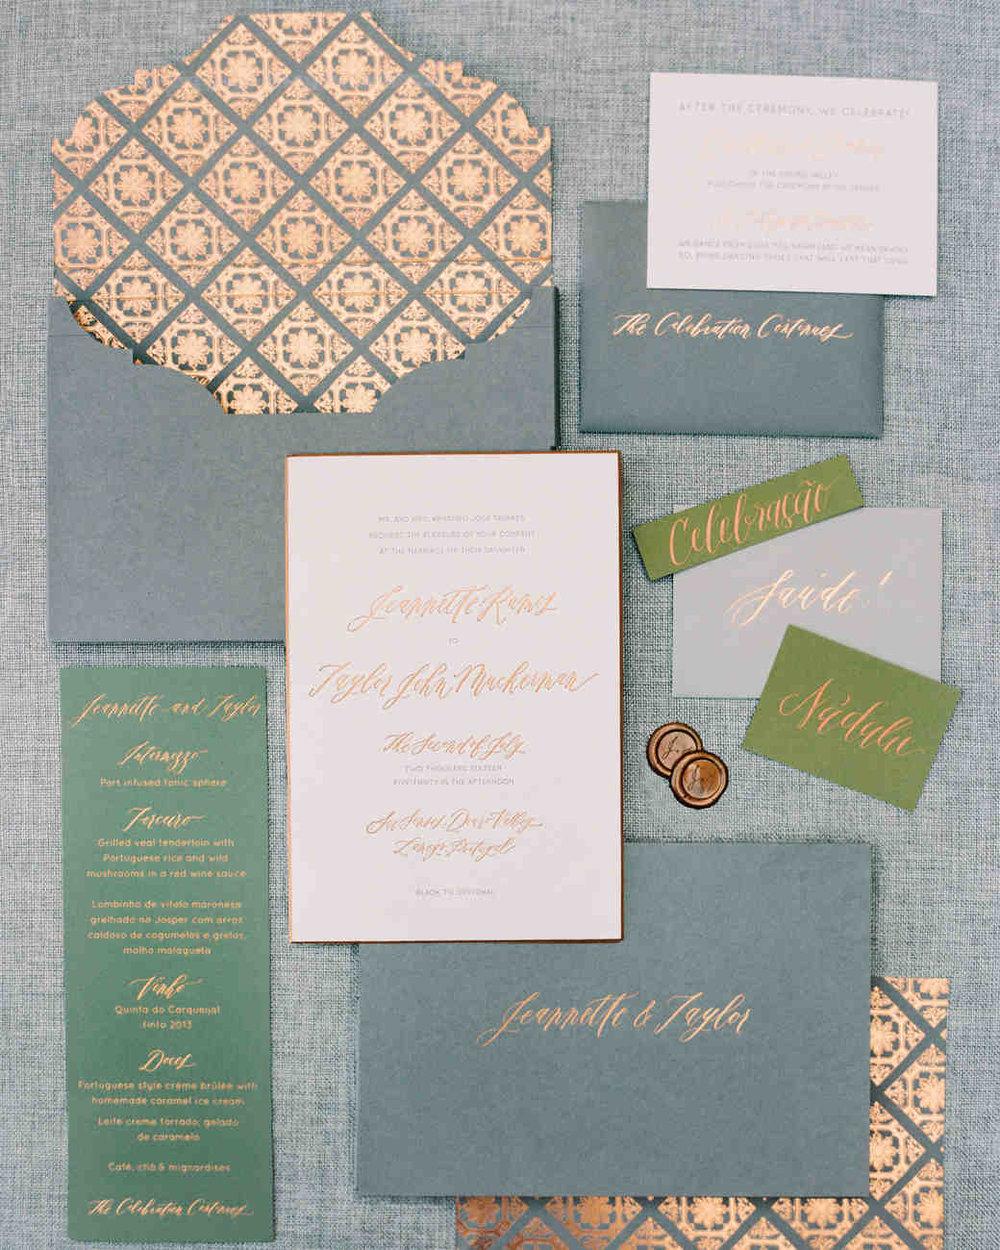 jeannette-taylor-wedding-portugal-stationery-103105718_vert.jpg